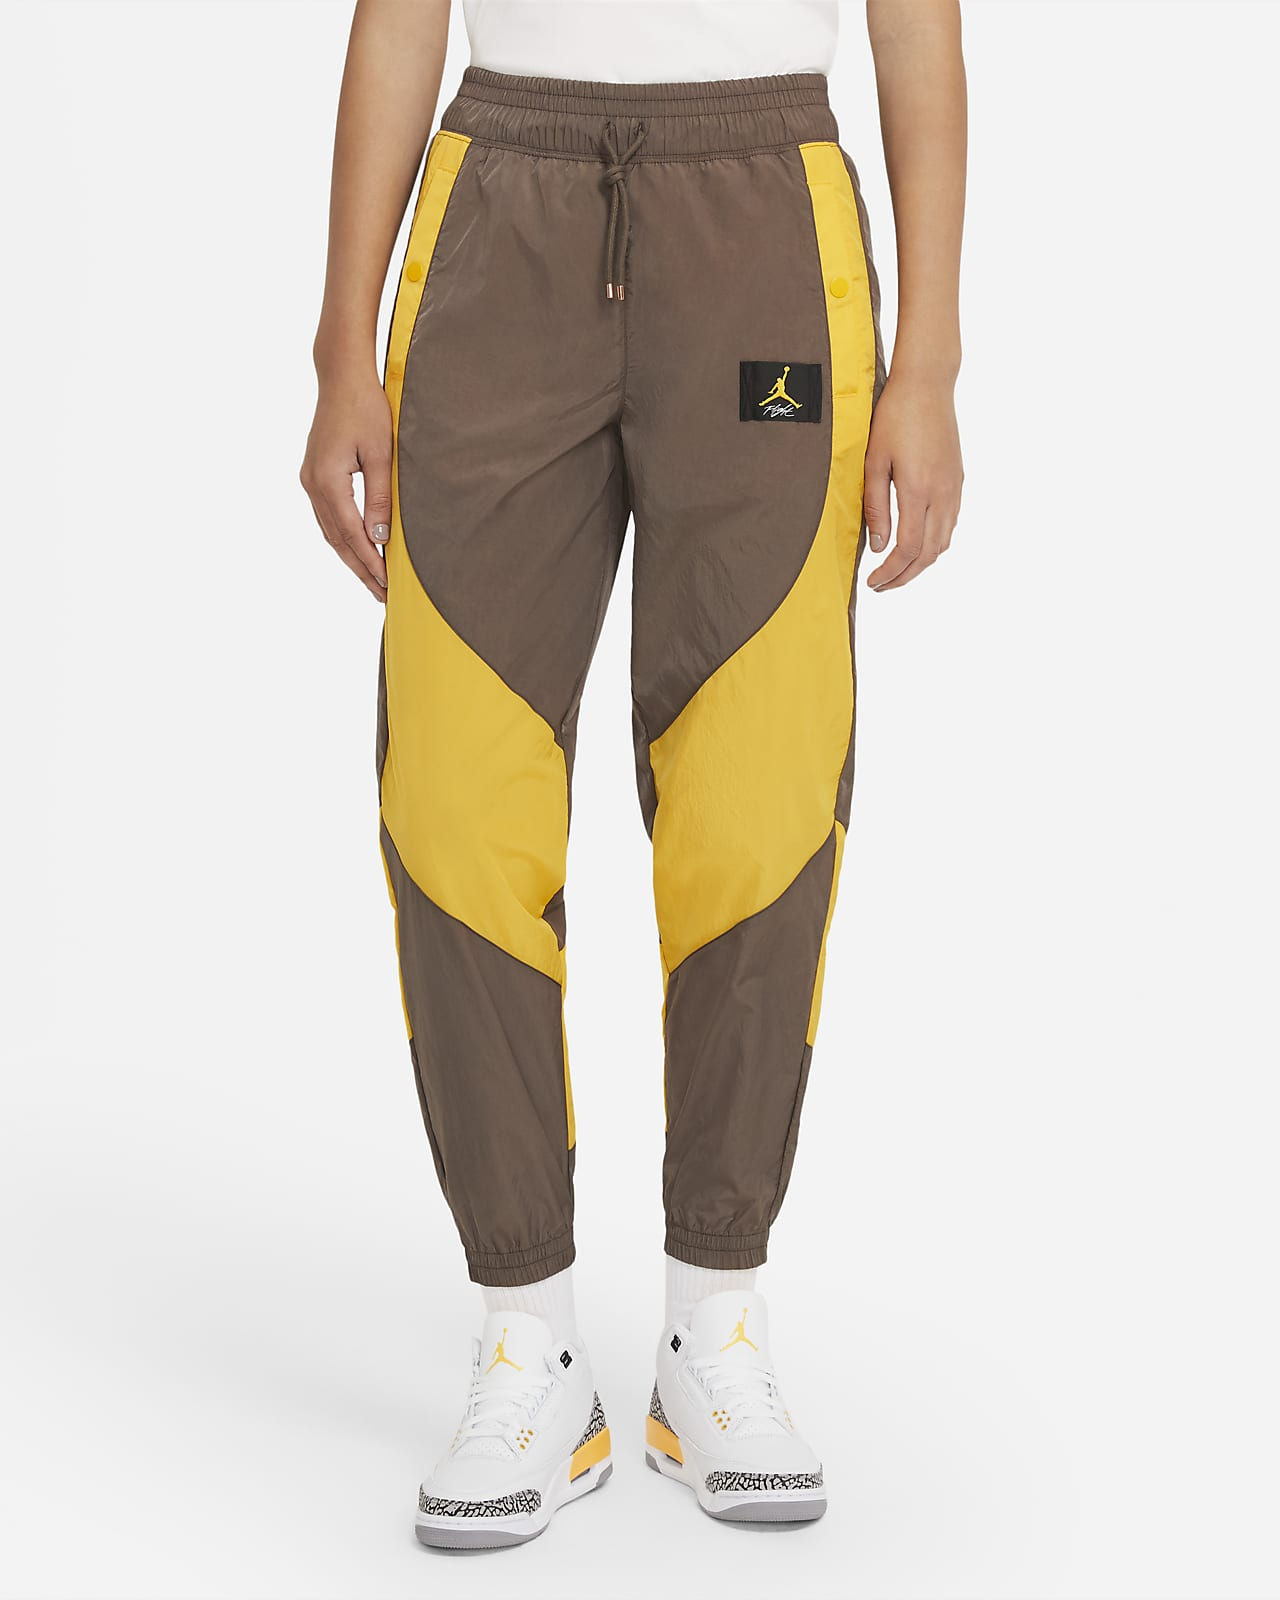 Pantalon tissé Jordan pour Femme